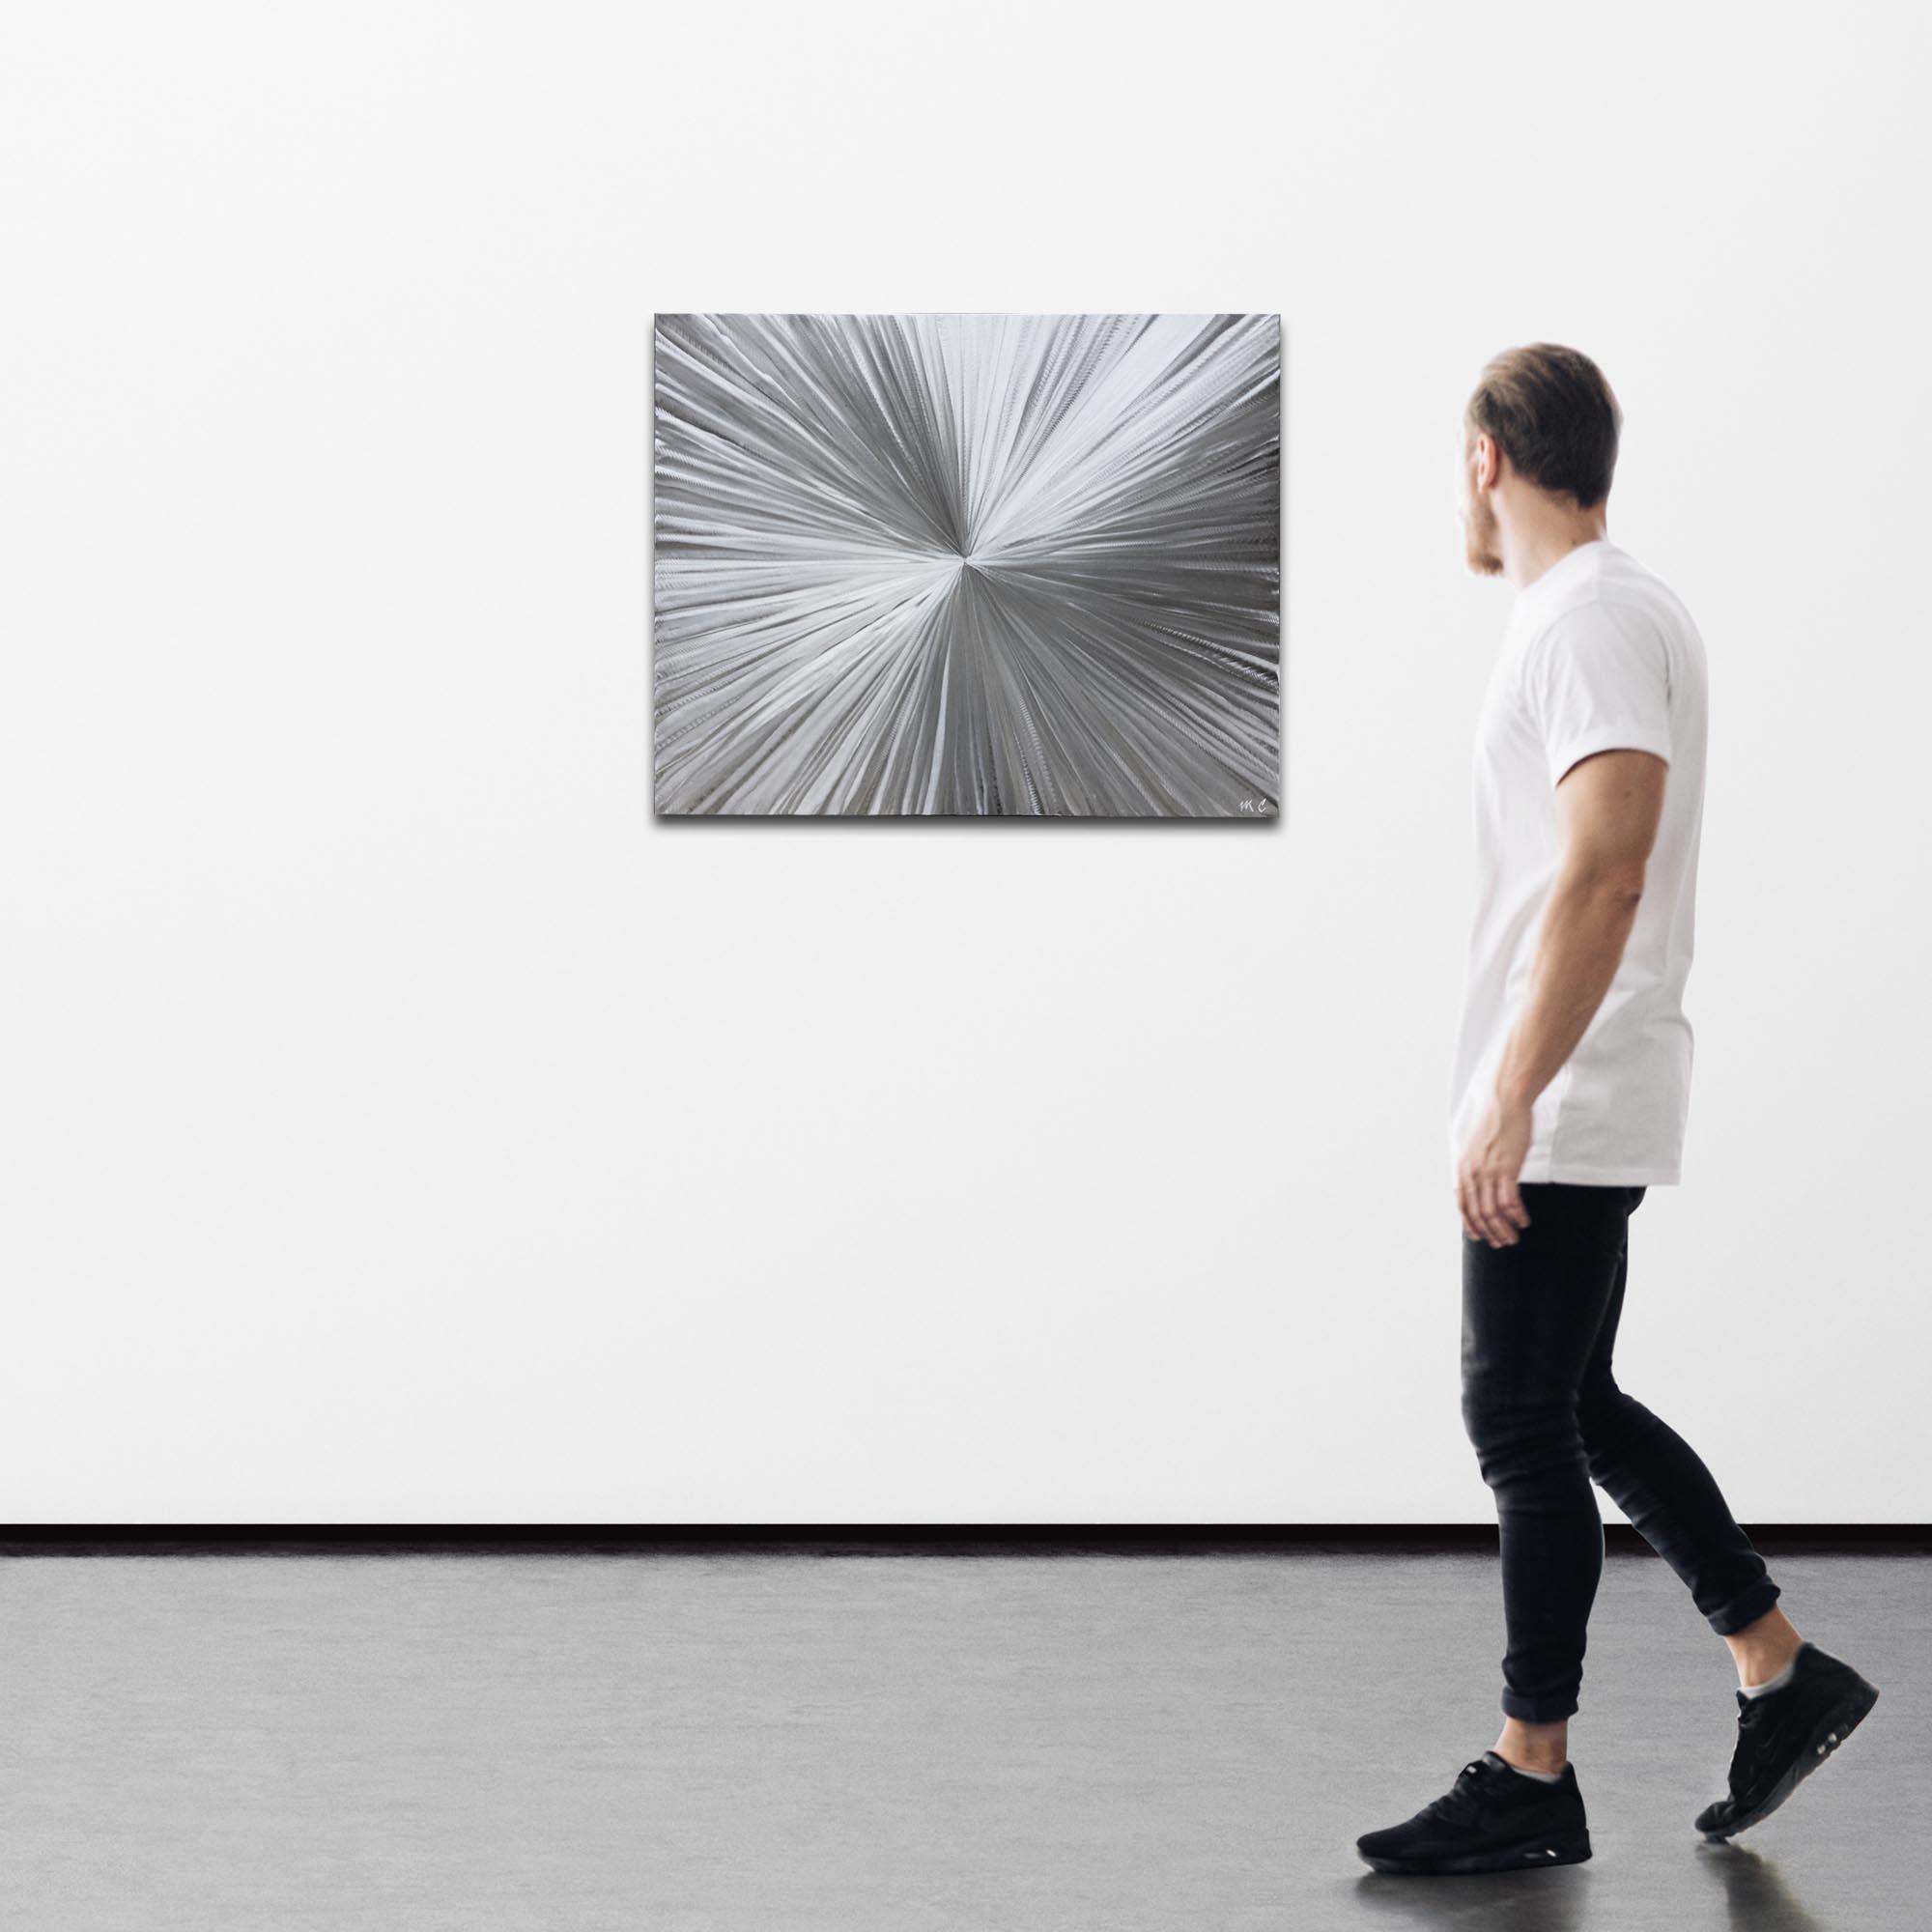 Bursting by Helena Martin - Sunburst Metal Art on Natural Aluminum - Image 3